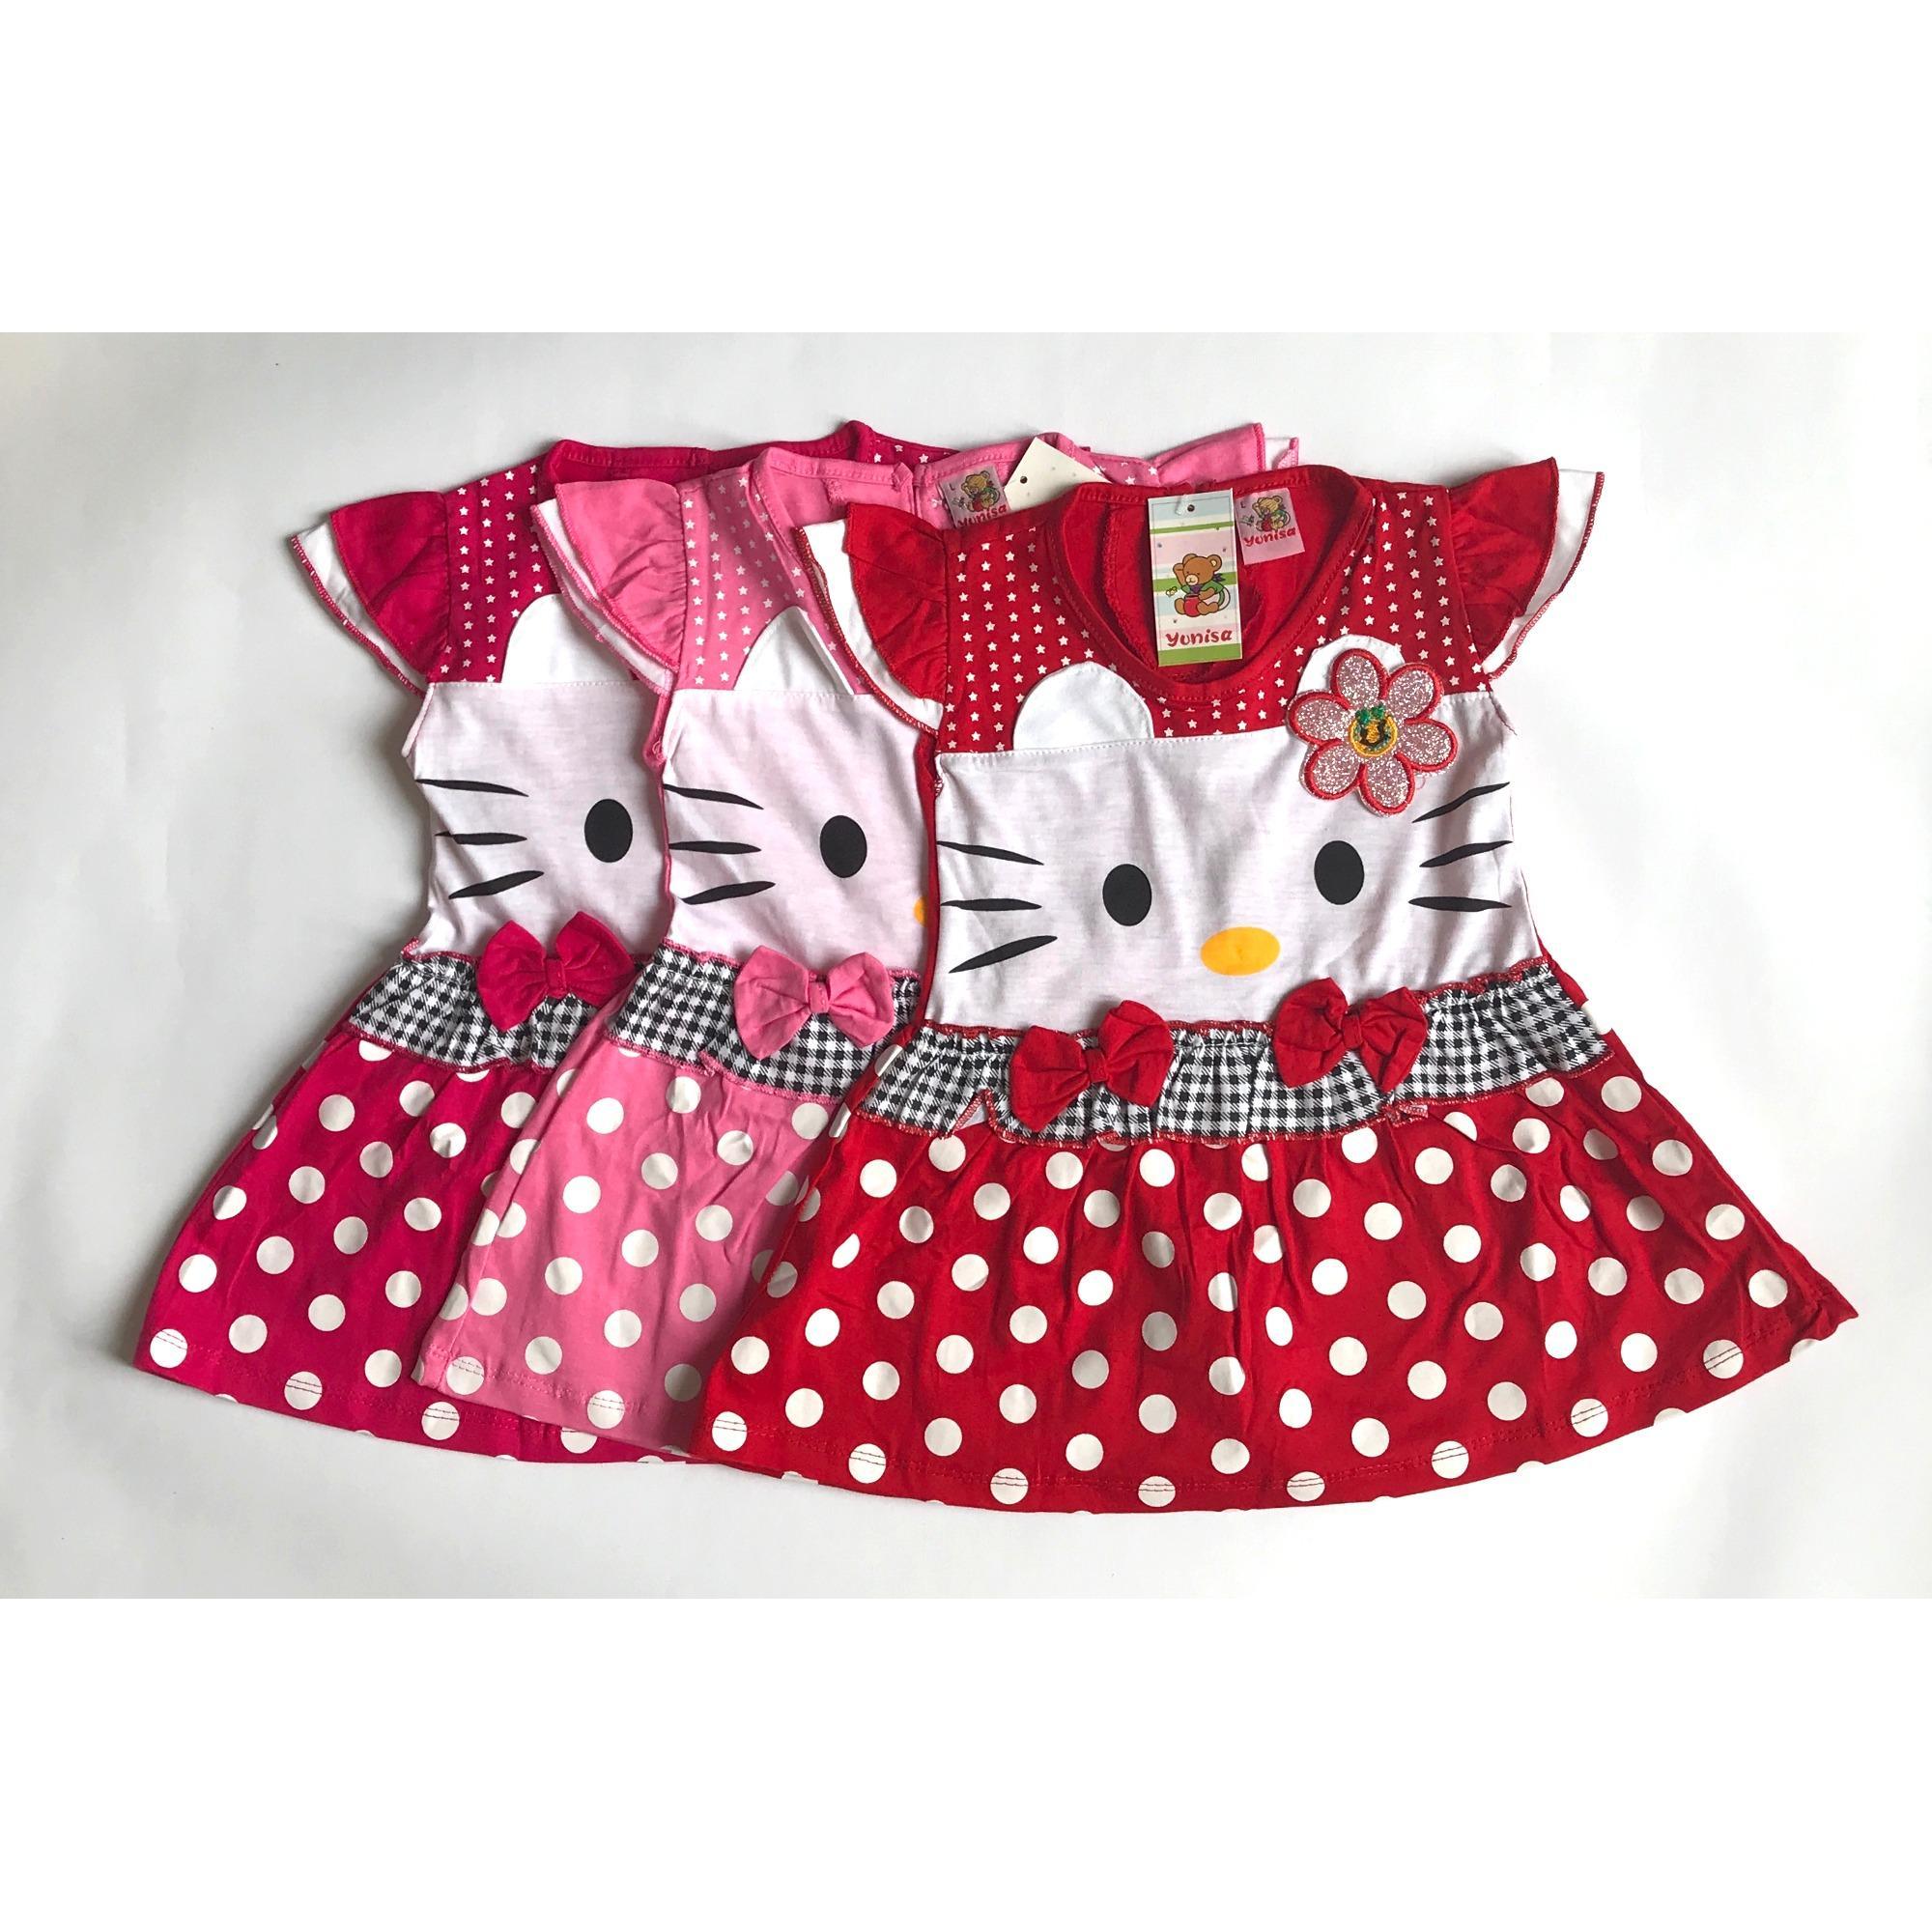 Gambar Produk Rinci BAYIe - Setelan Baju Bayi Dress Perempuan motif HELLO KITTY YUNISA / Pakaian anak cewek umur 1 - 2 tahun Terkini